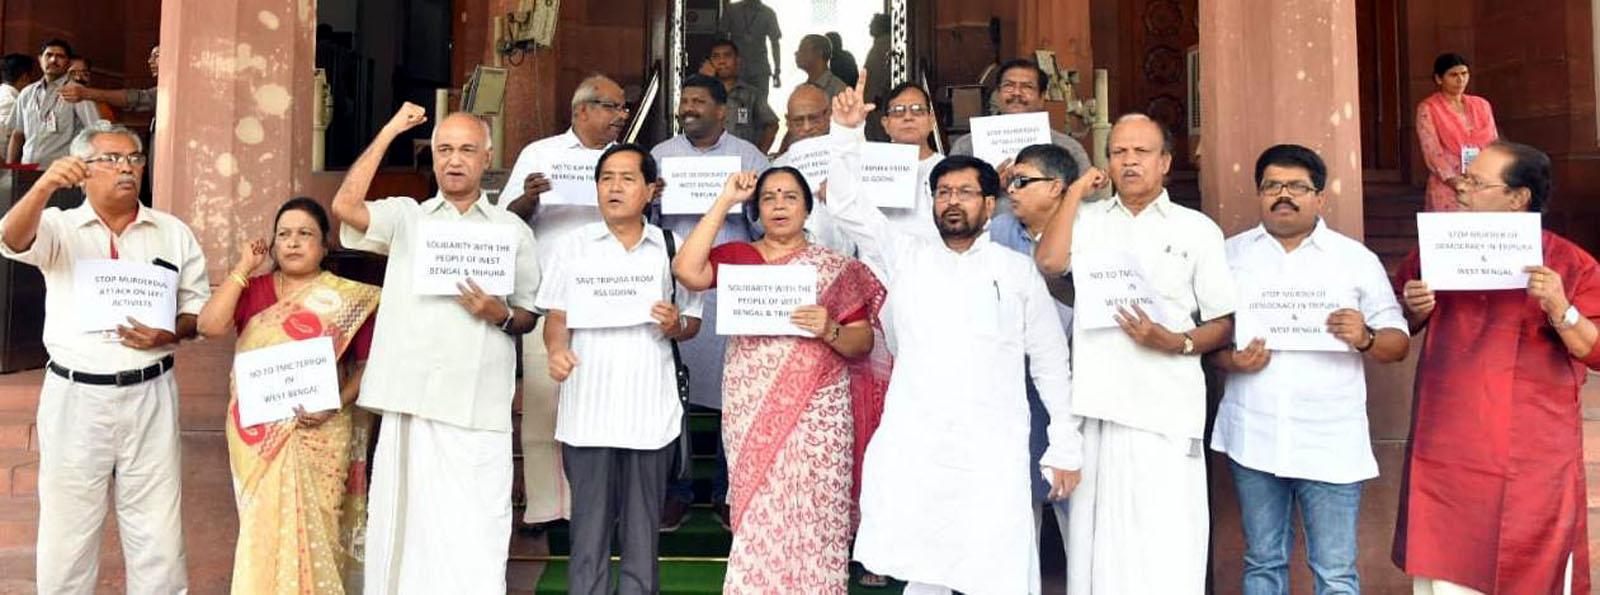 India party partea 2